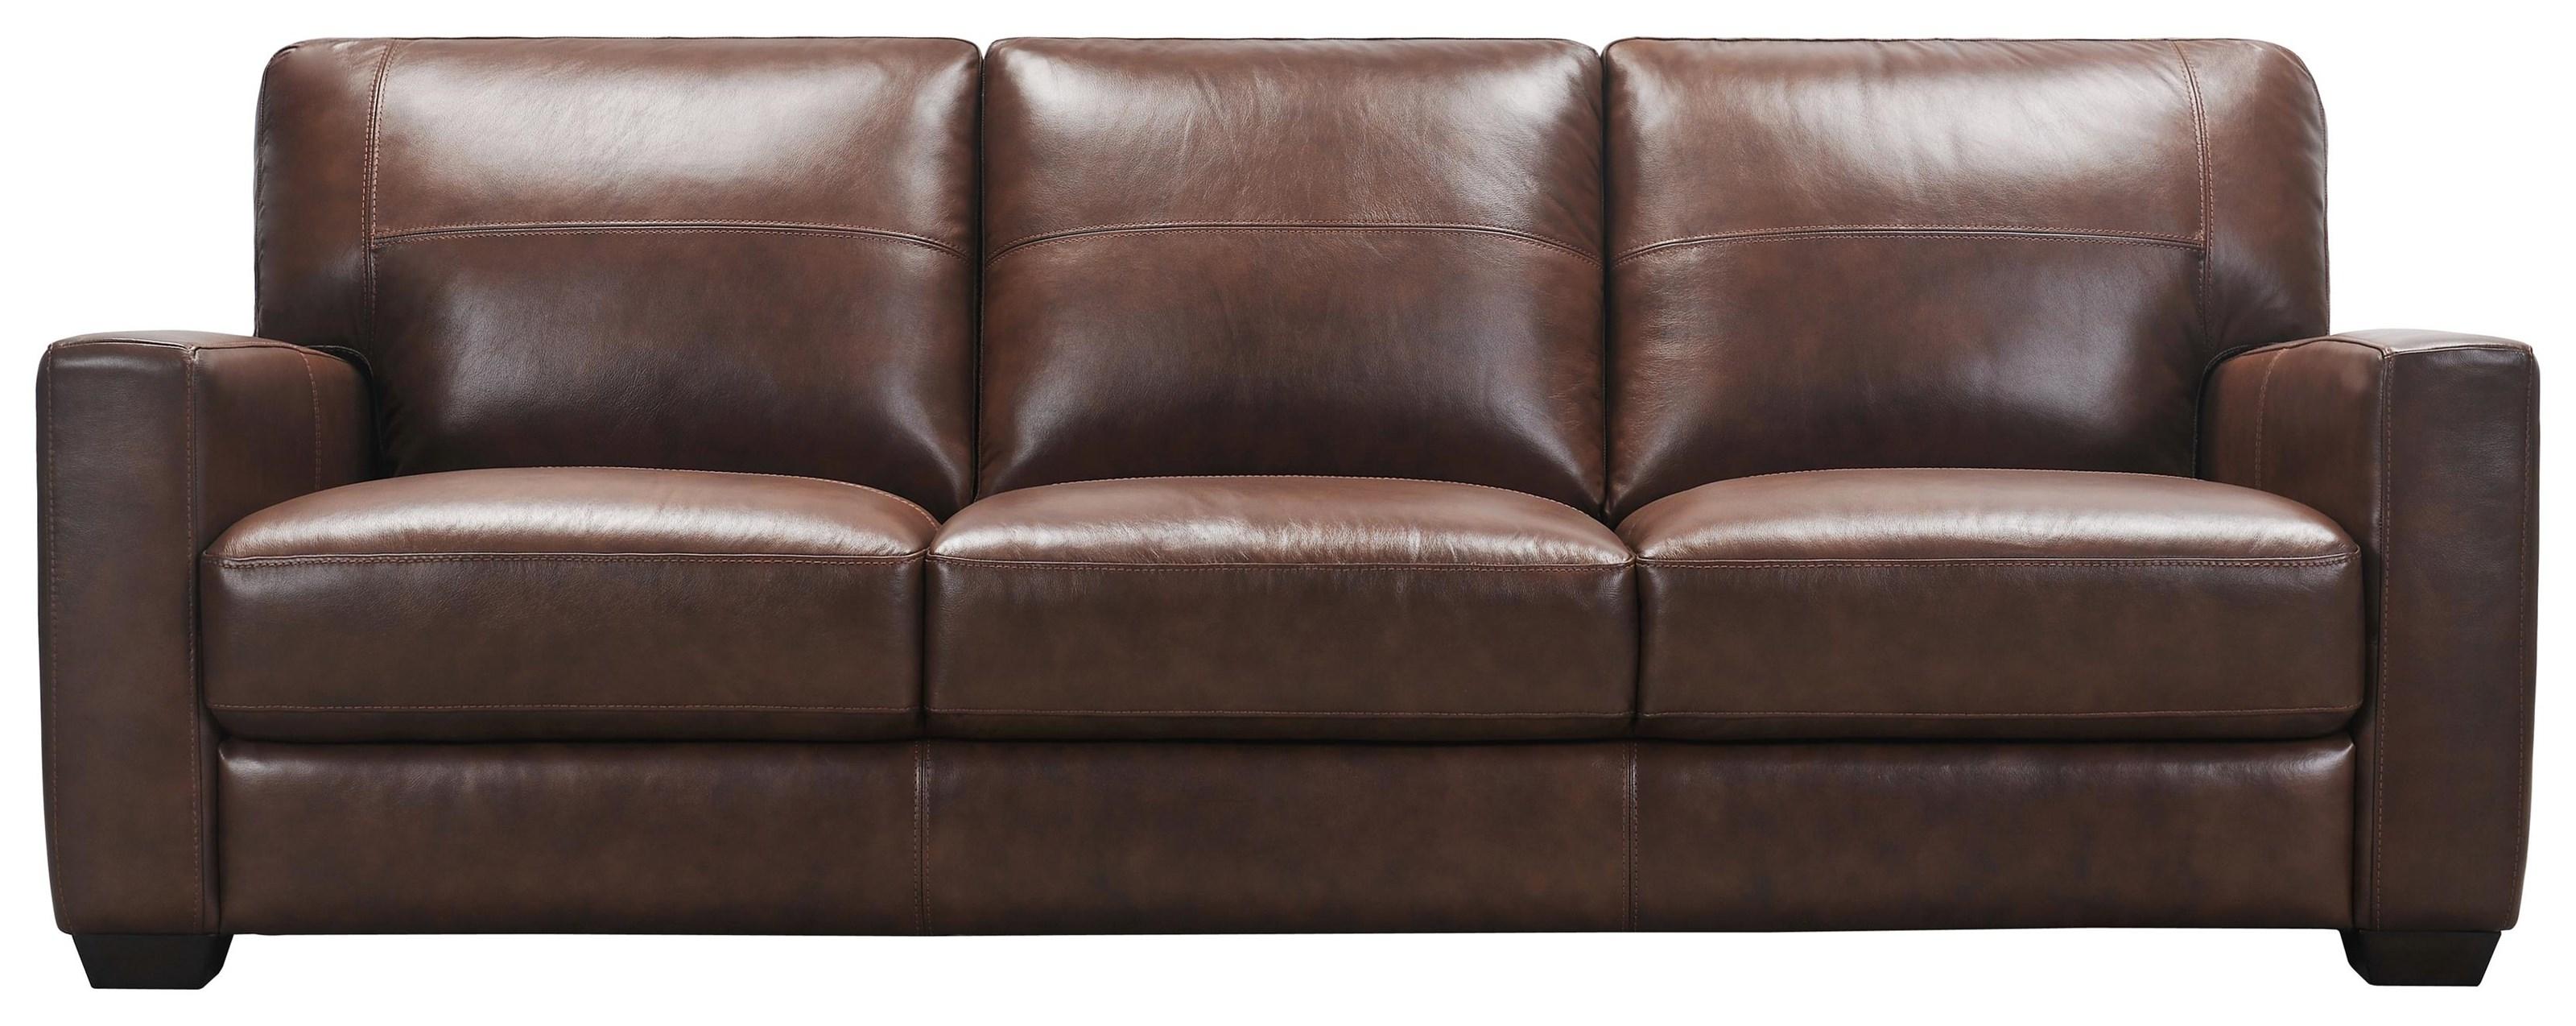 32570 Sofa by Violino at Stoney Creek Furniture